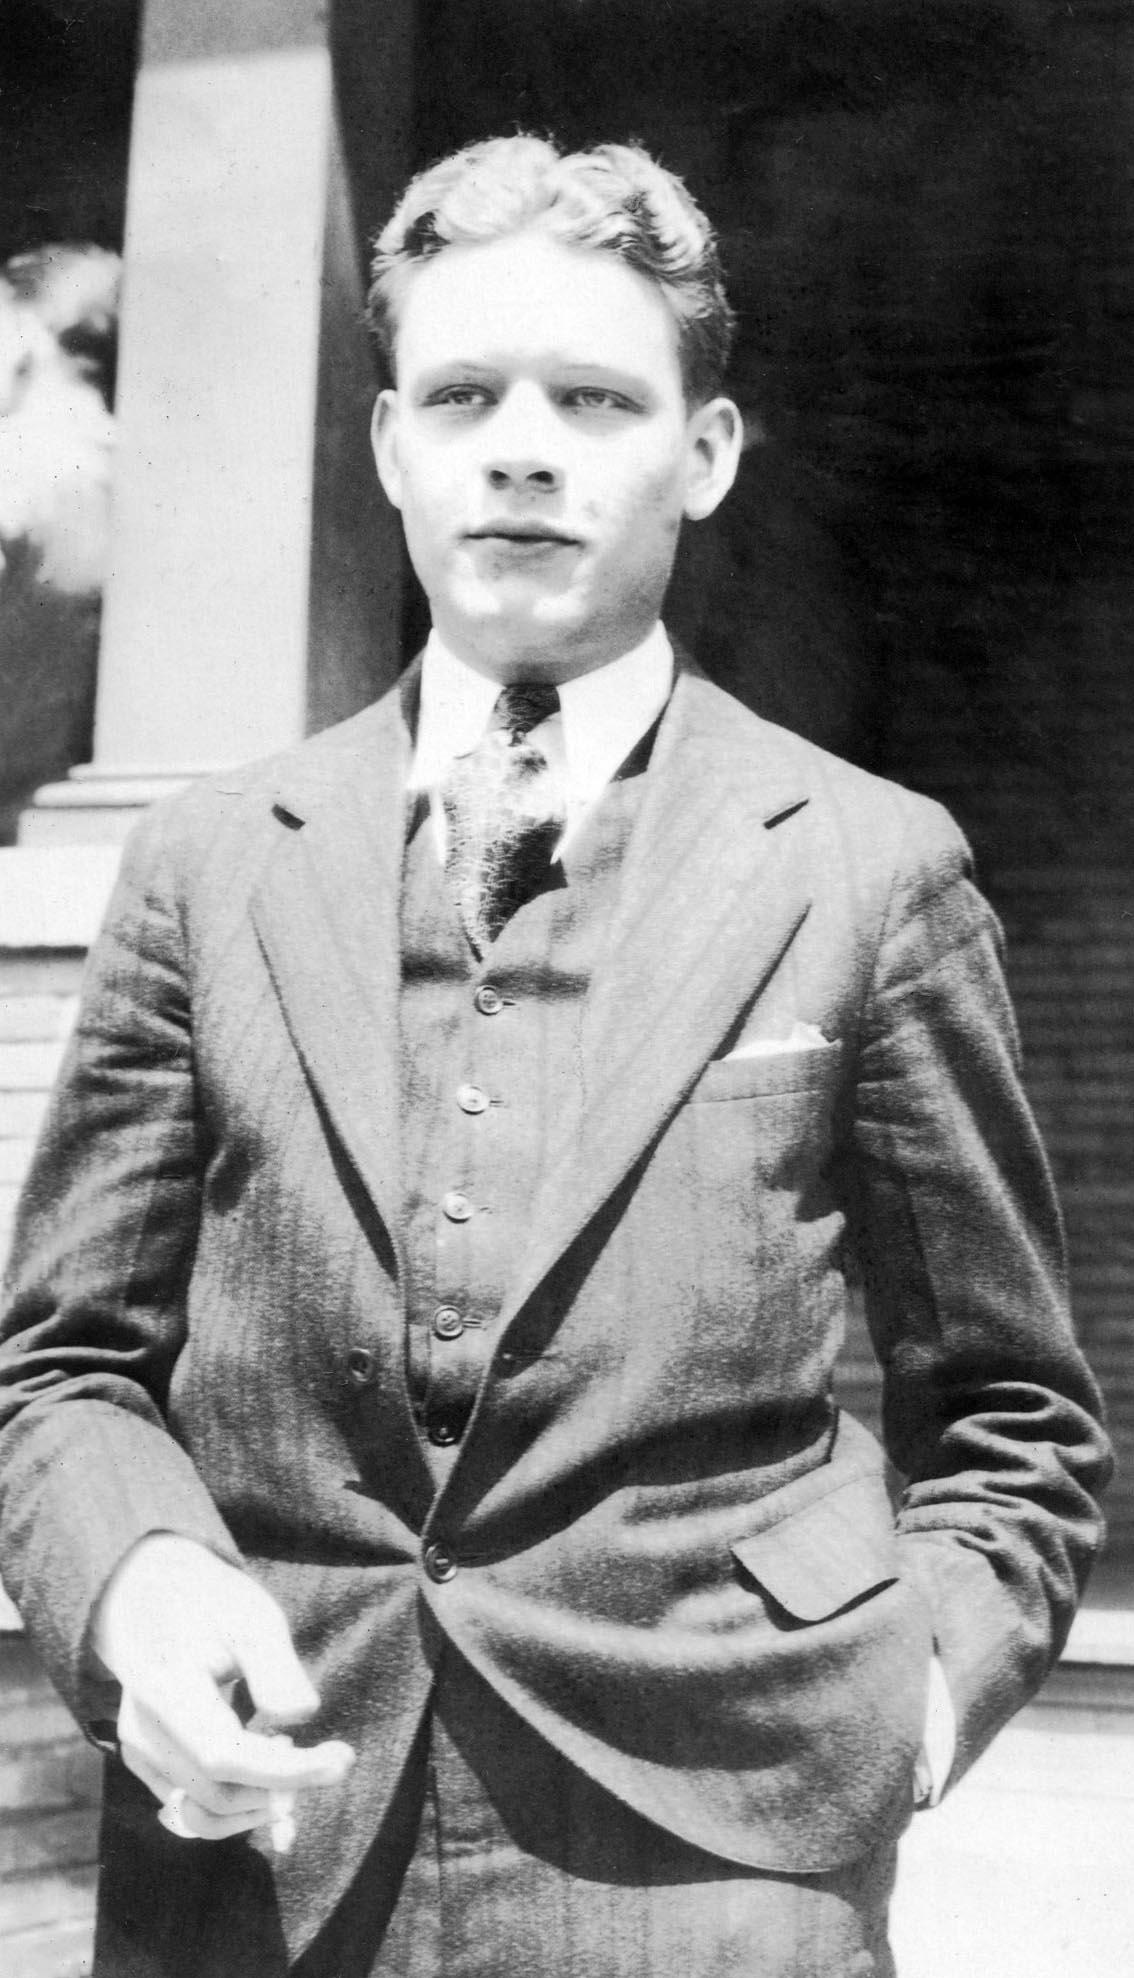 Gordon S. Altman 1929